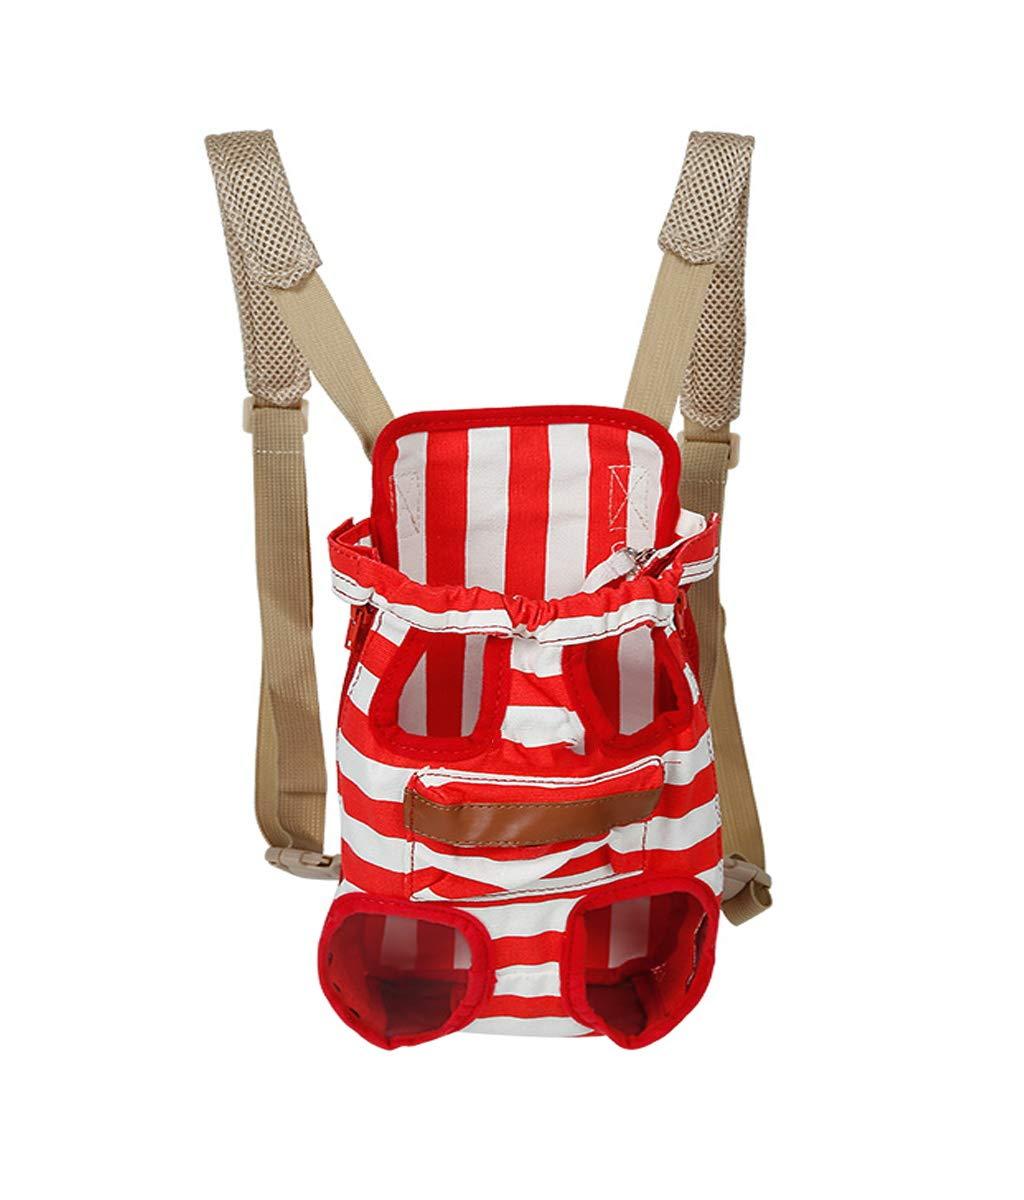 Red SmallPet Backpack Front and Back Comfortable Back and Shoulder Pads Safety Belt with Storage Bag (Red Dark bluee for 2.5Kg7Kg Pet)